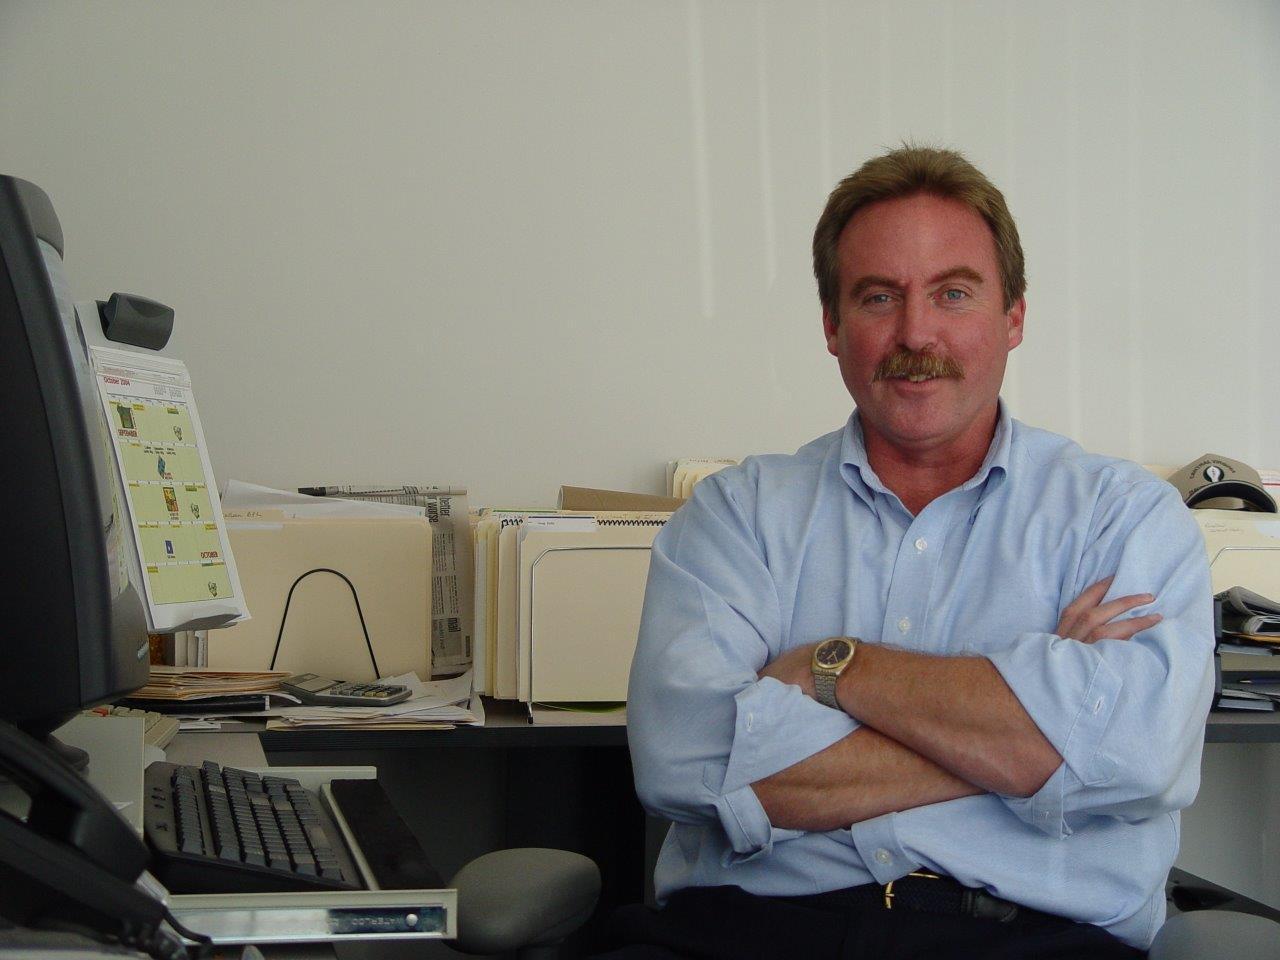 Happy Trails Greg Kelly : CVEC Trusted Friend & Colleague ...